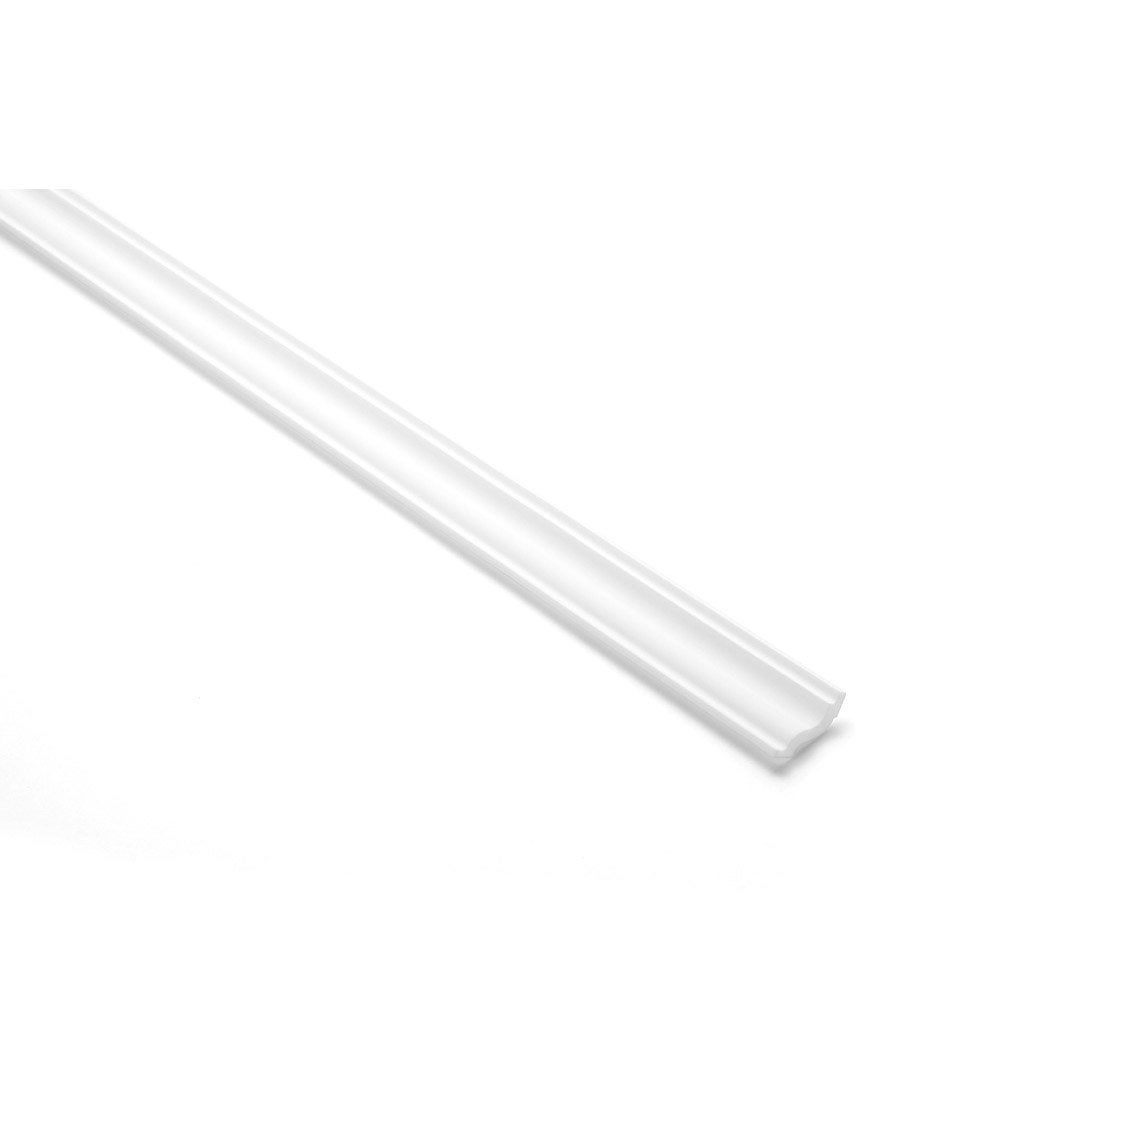 Plafond placo ou pvc cergy estimation devis toiture - Polystyrene extrude castorama ...